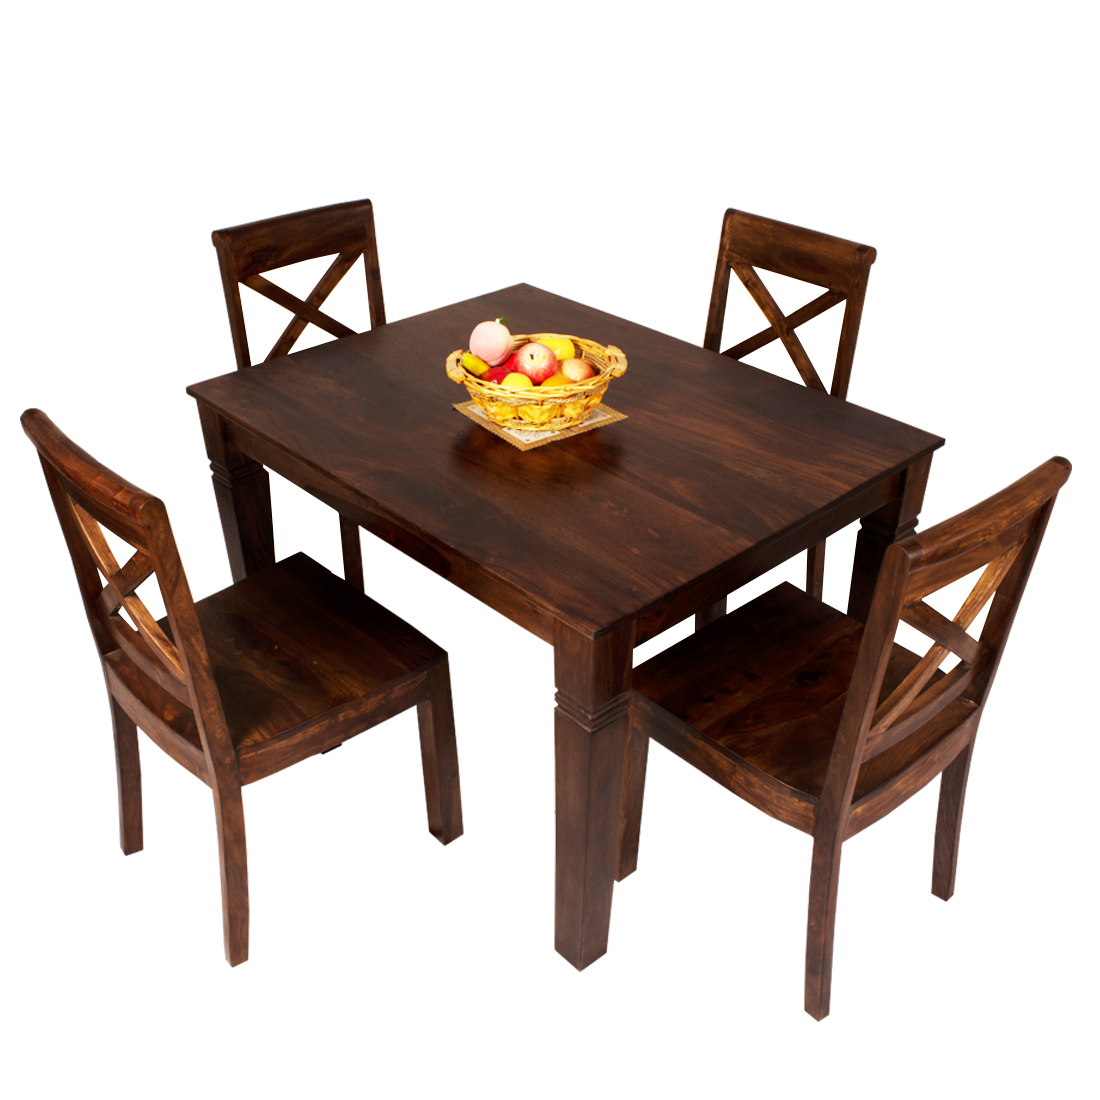 Bharat Lifestyle Richie Wooden 4 Seater Dining Set 1 4